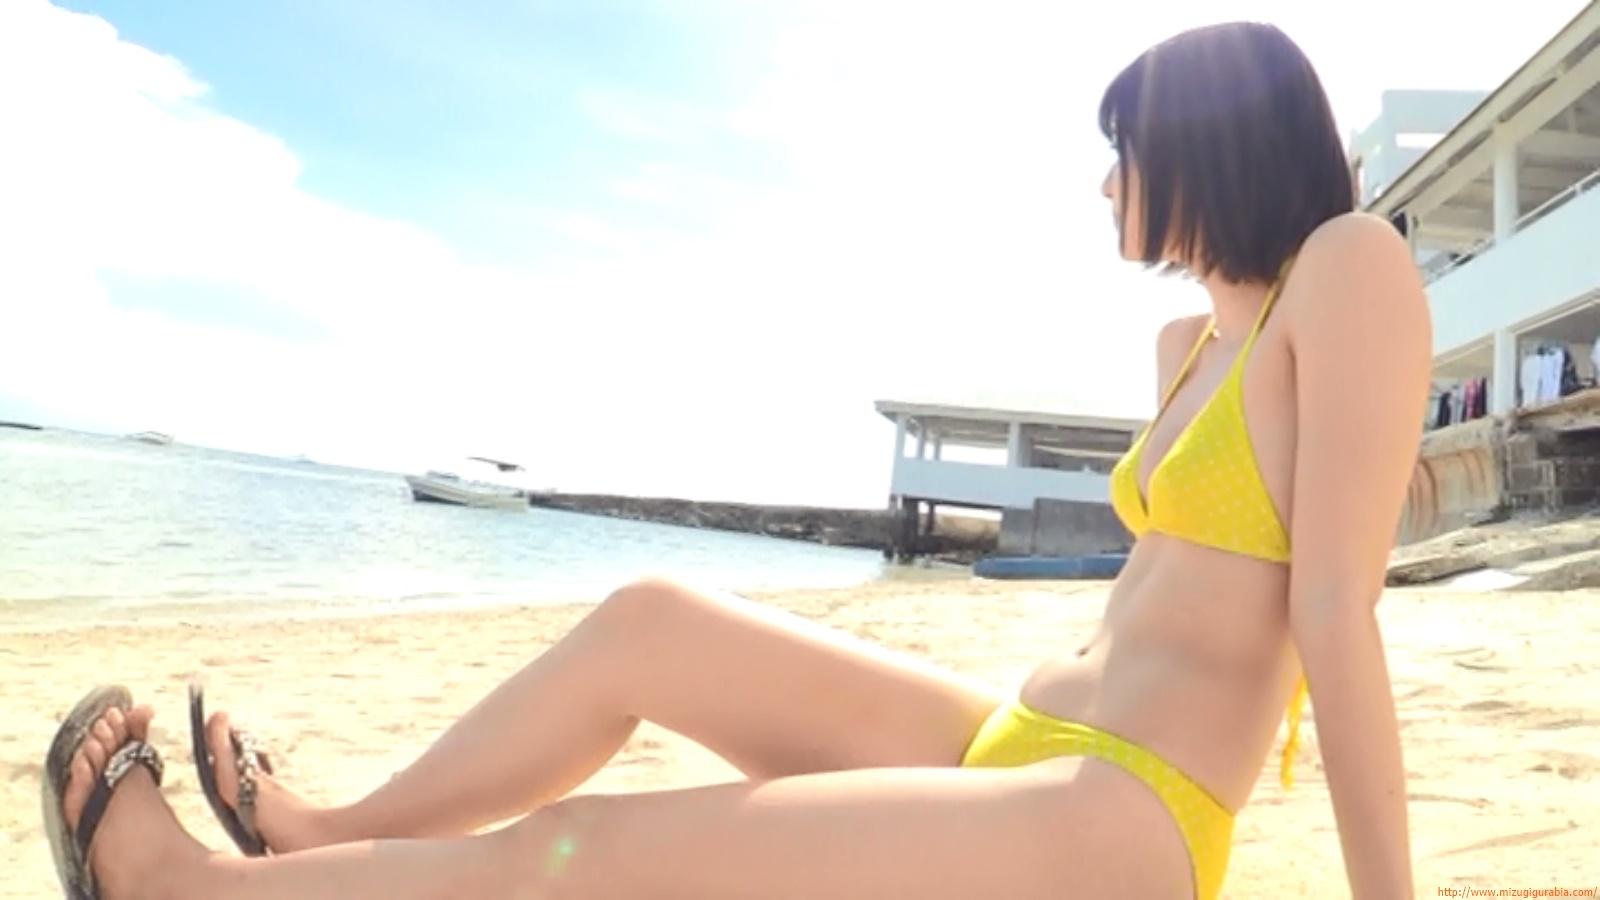 Beach dating211